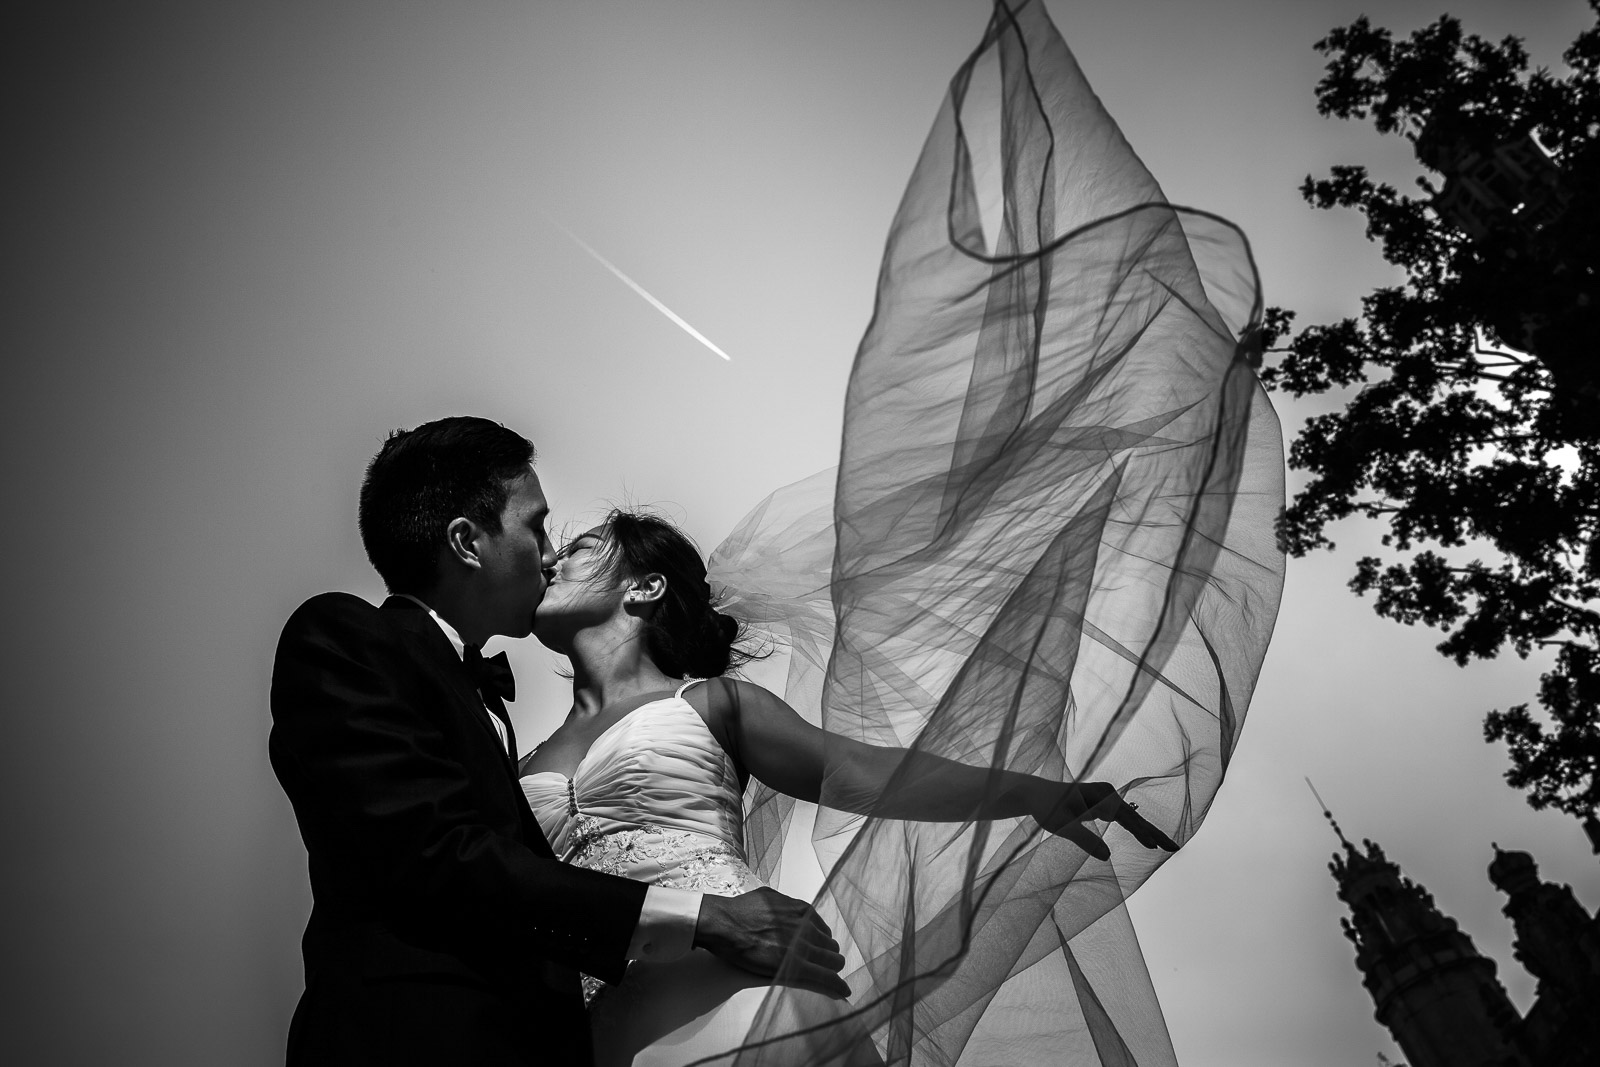 Barcelona, Spain Wedding Photographer - Cesc Giralt · Casual Wedding Photography